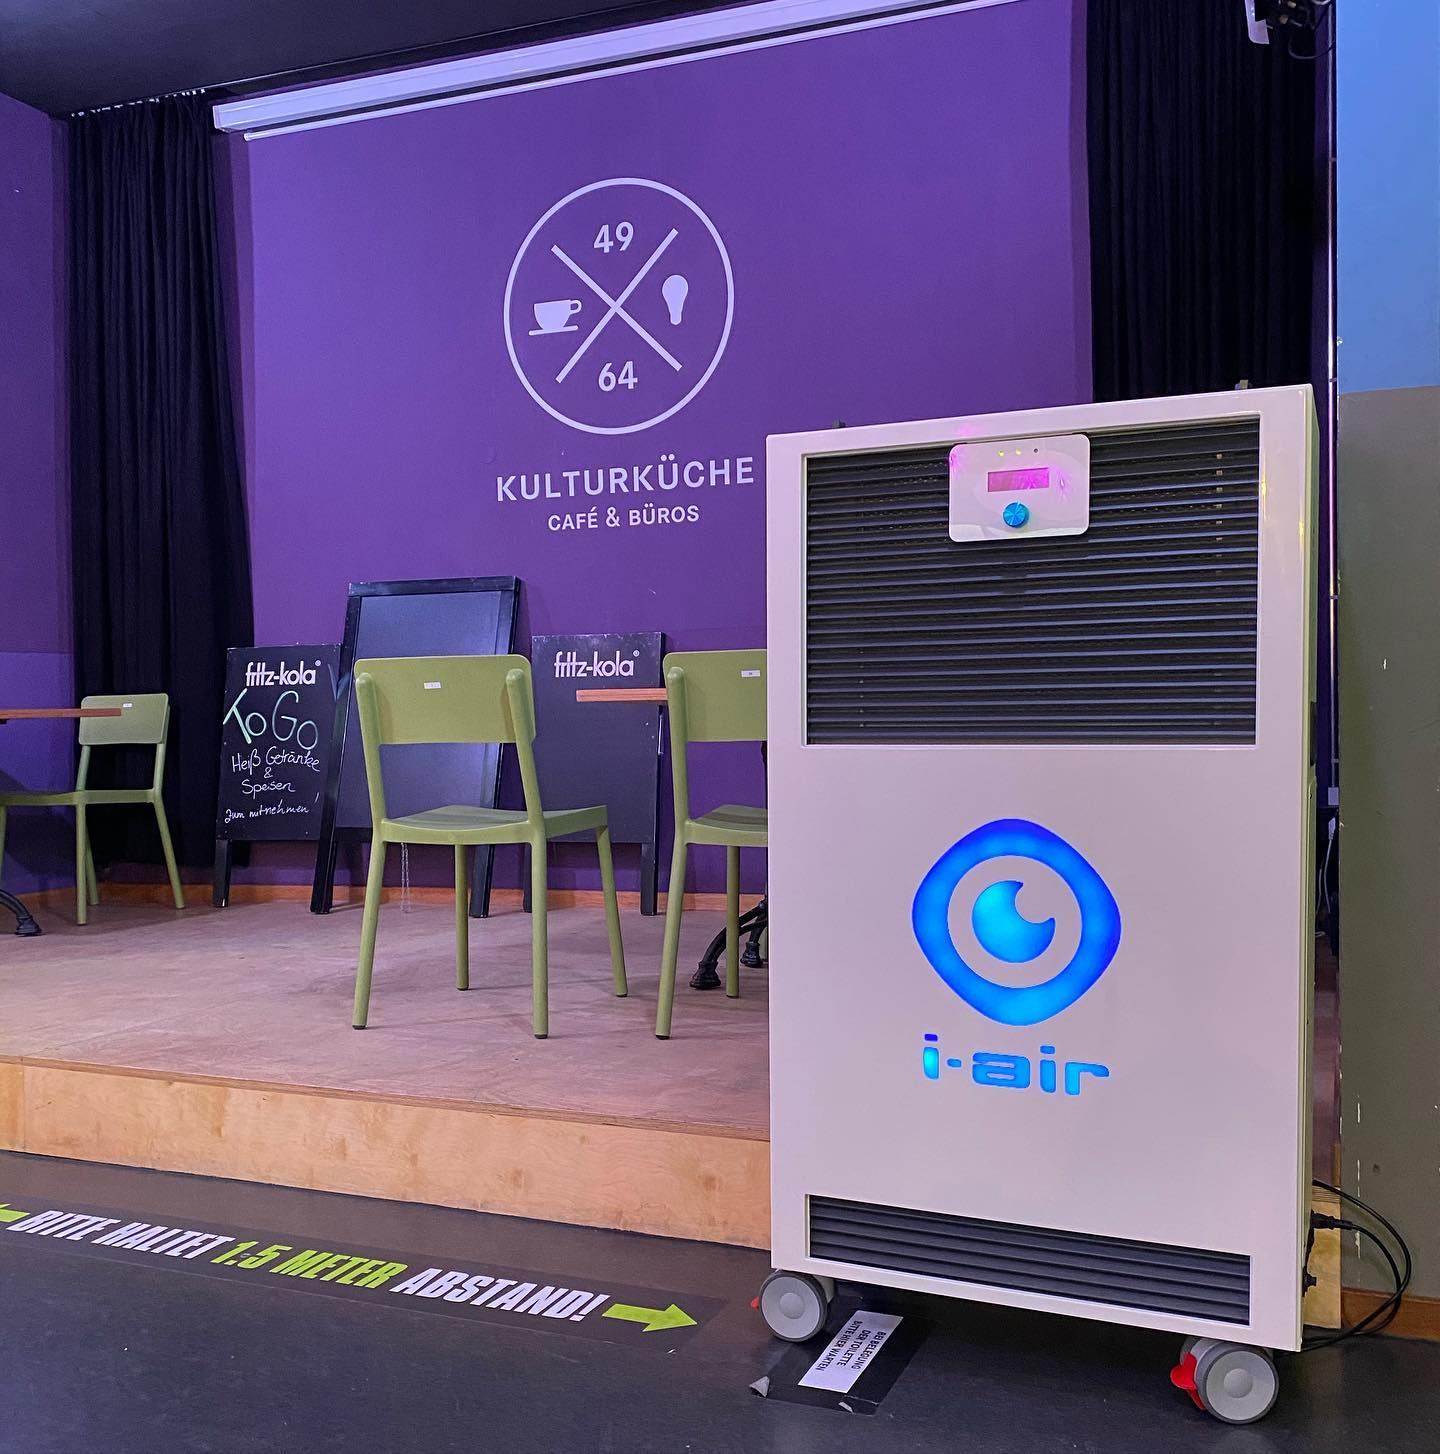 Saubere Luft in der Kulturküche  @kulturkueche @brodabrm